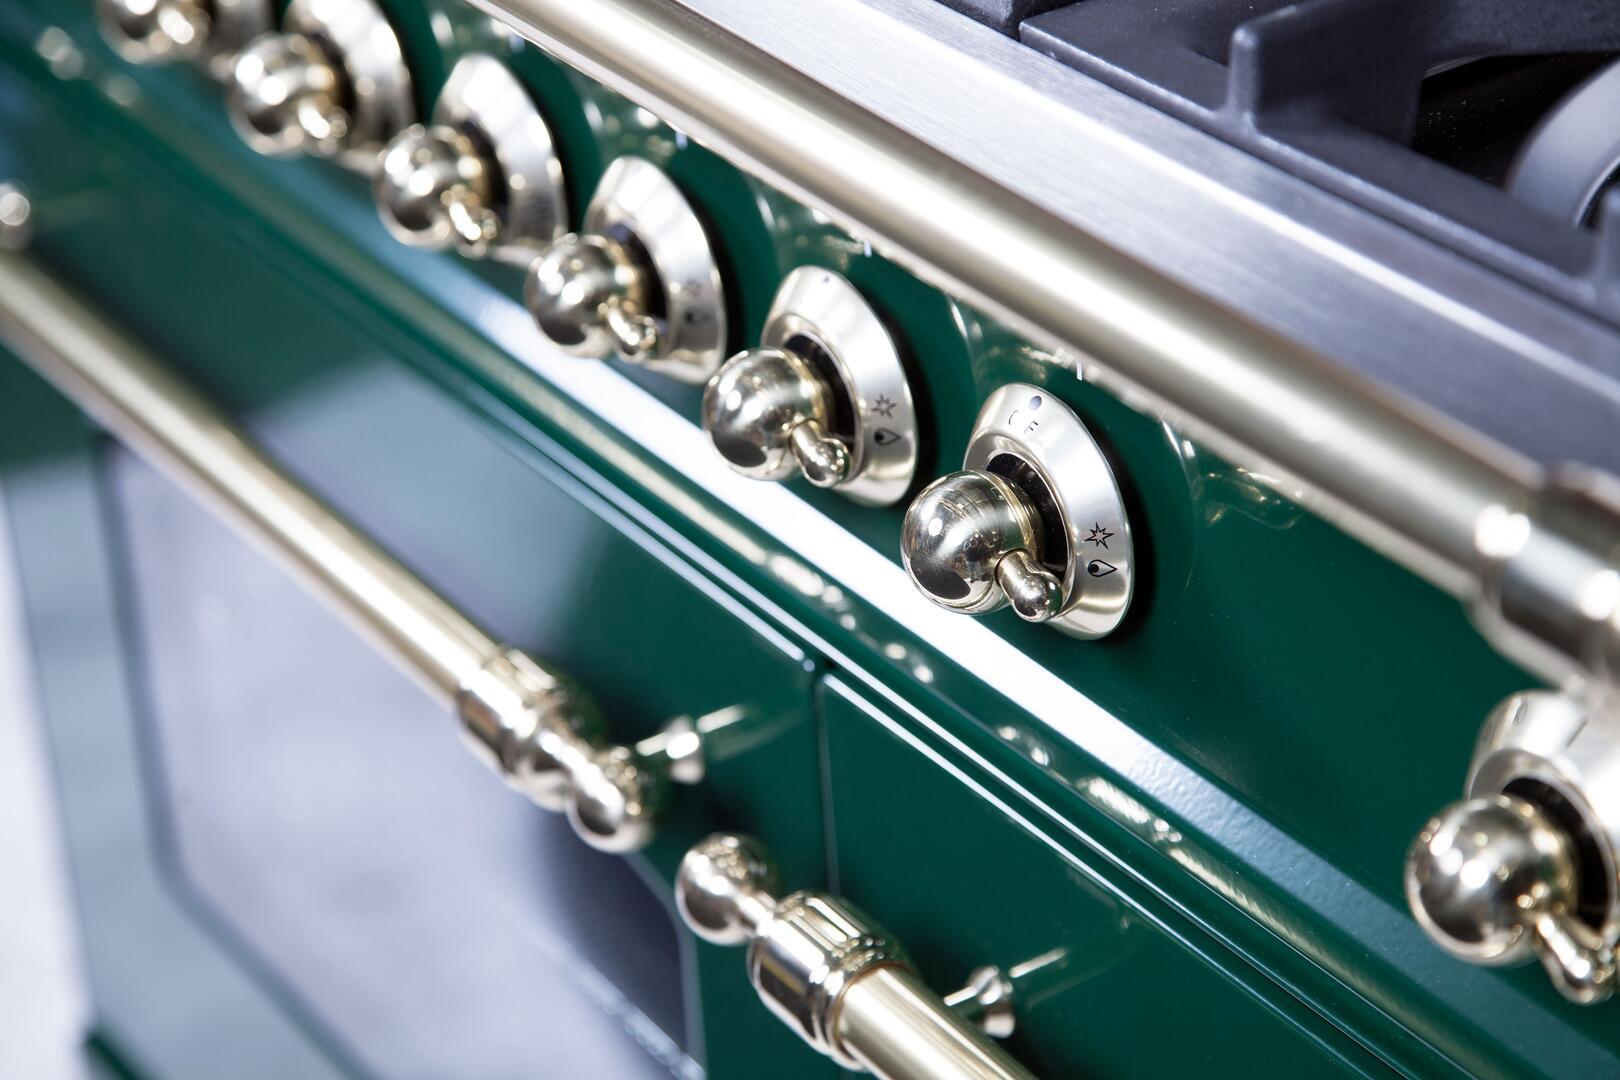 Ilve Nostalgie UPDN100FDMPVSLP Freestanding Dual Fuel Range Green, UPDN100FDMPVSLP Details